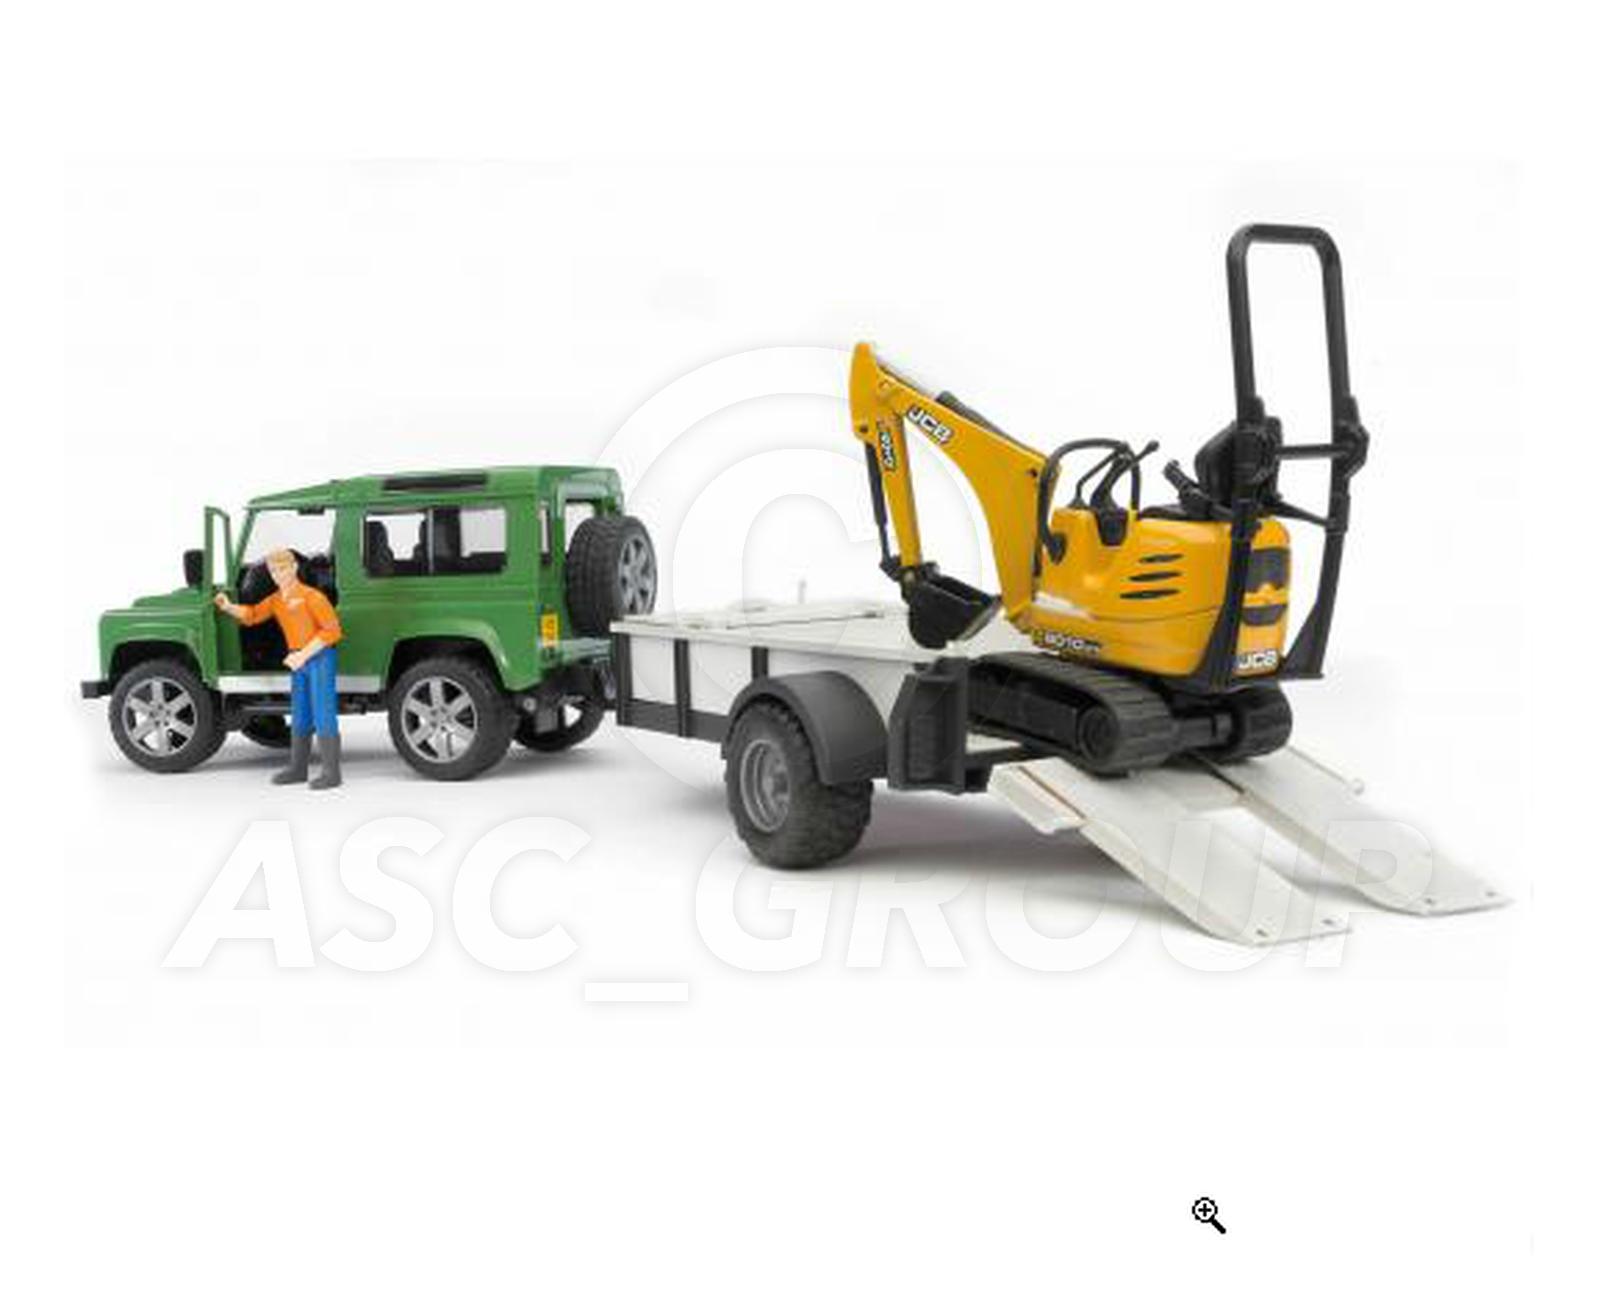 Bruder Toys 02593 Land Rover Defender Amp Trailer Micro